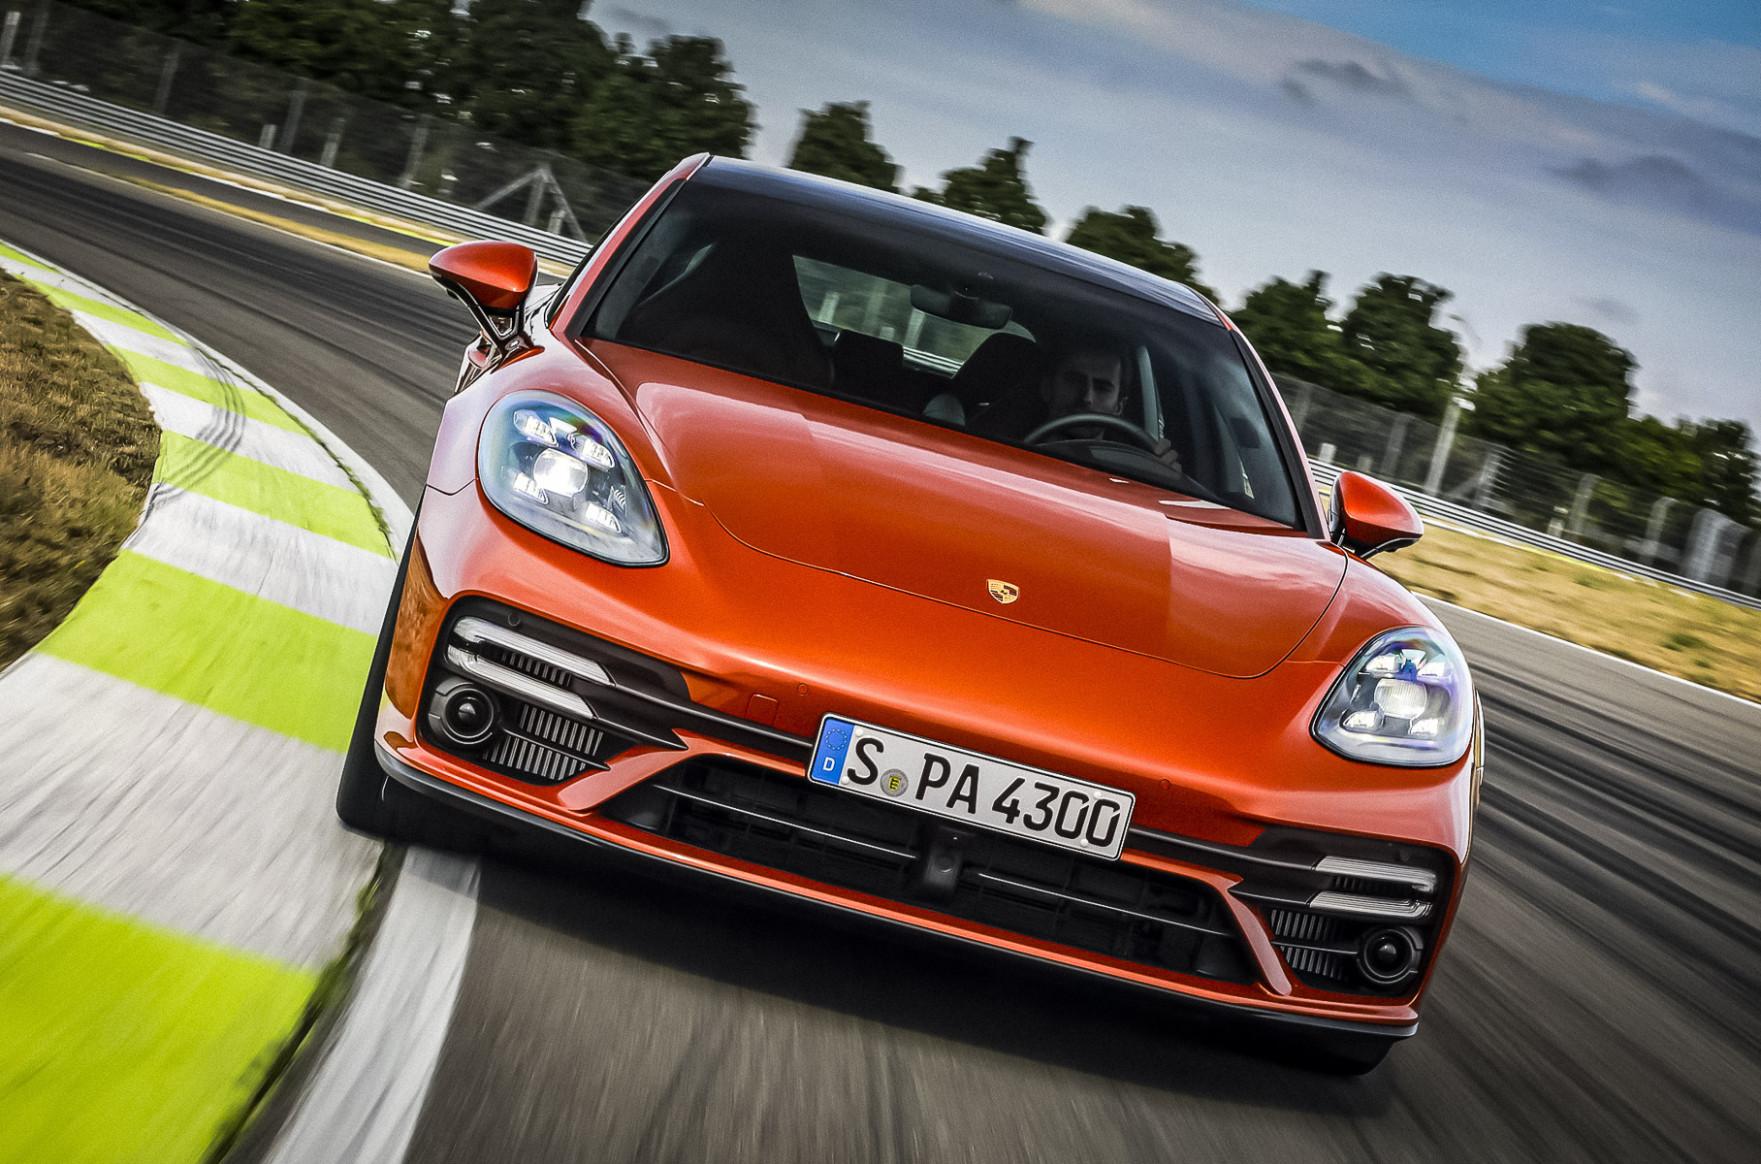 Redesign and Concept 2022 The Porsche Panamera